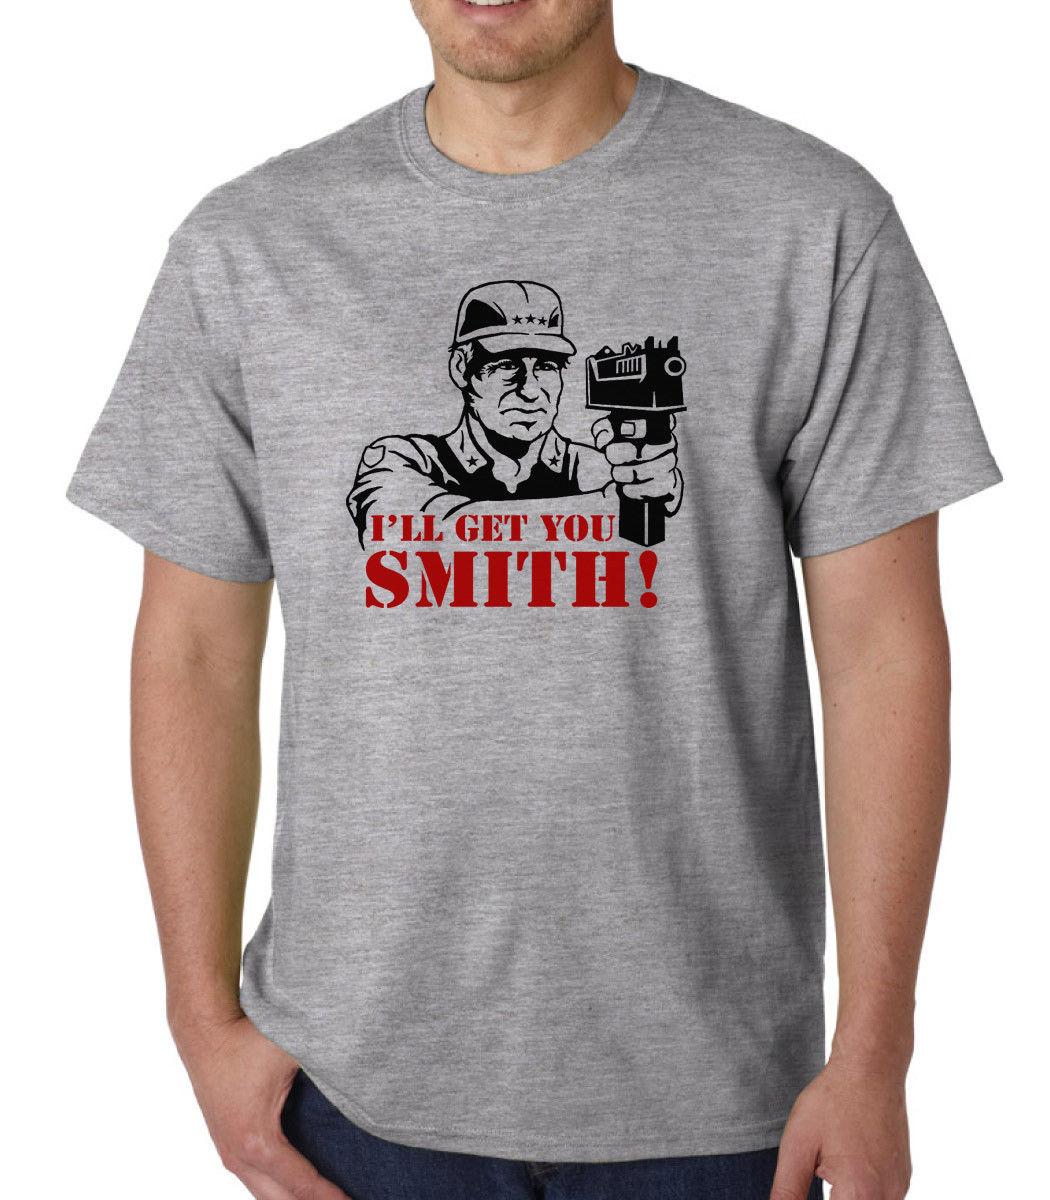 Decker The A-team T-shirt Ill Get You Smith Hannibal Baracus Murdoch Cool Casual Pride T Shirt Men Unisex New Apprehensive Col